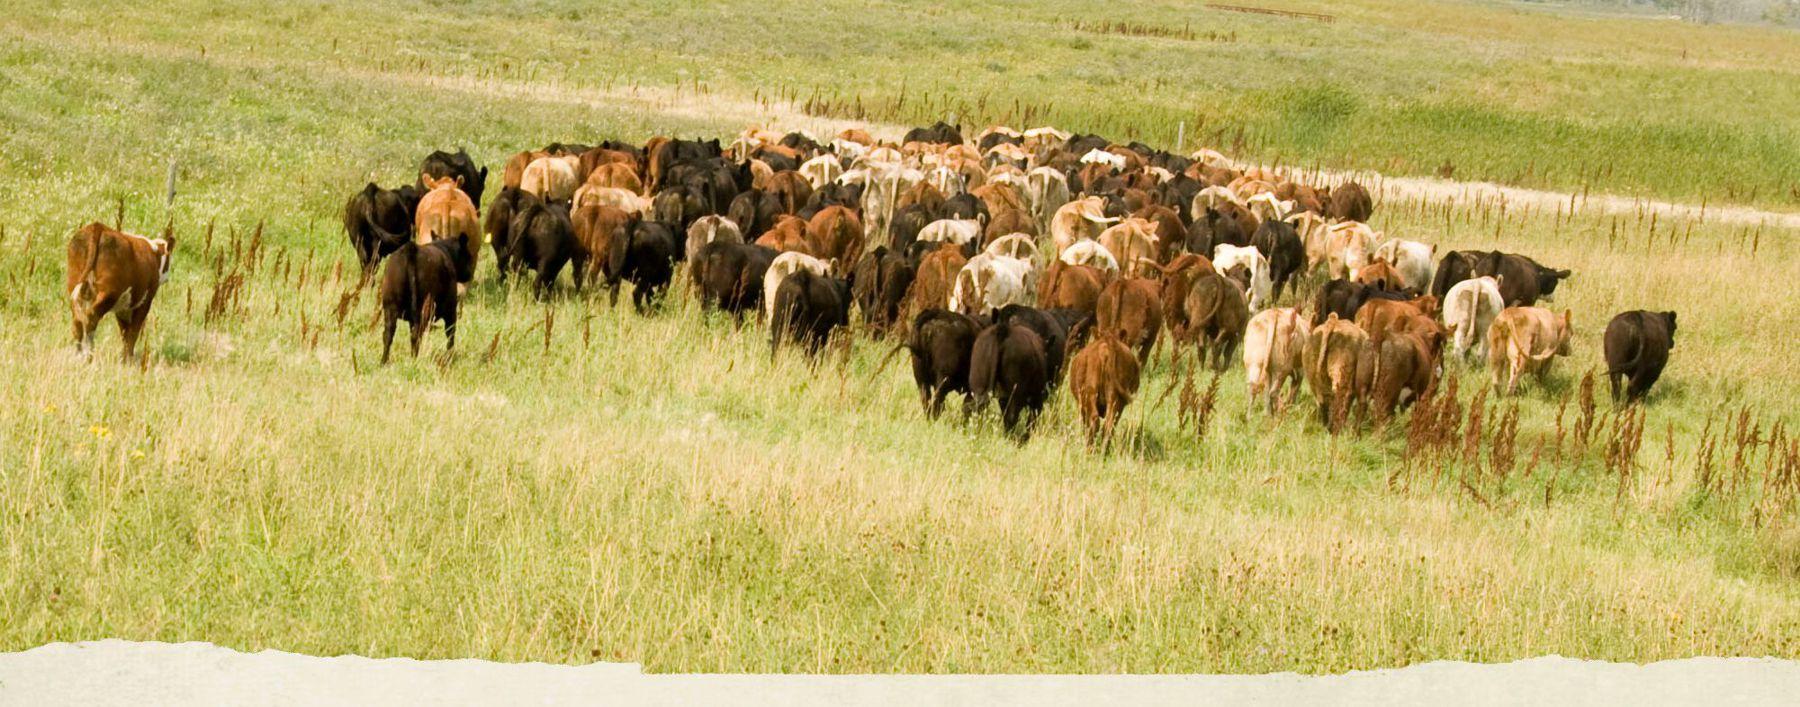 prairie-livestock-banner1